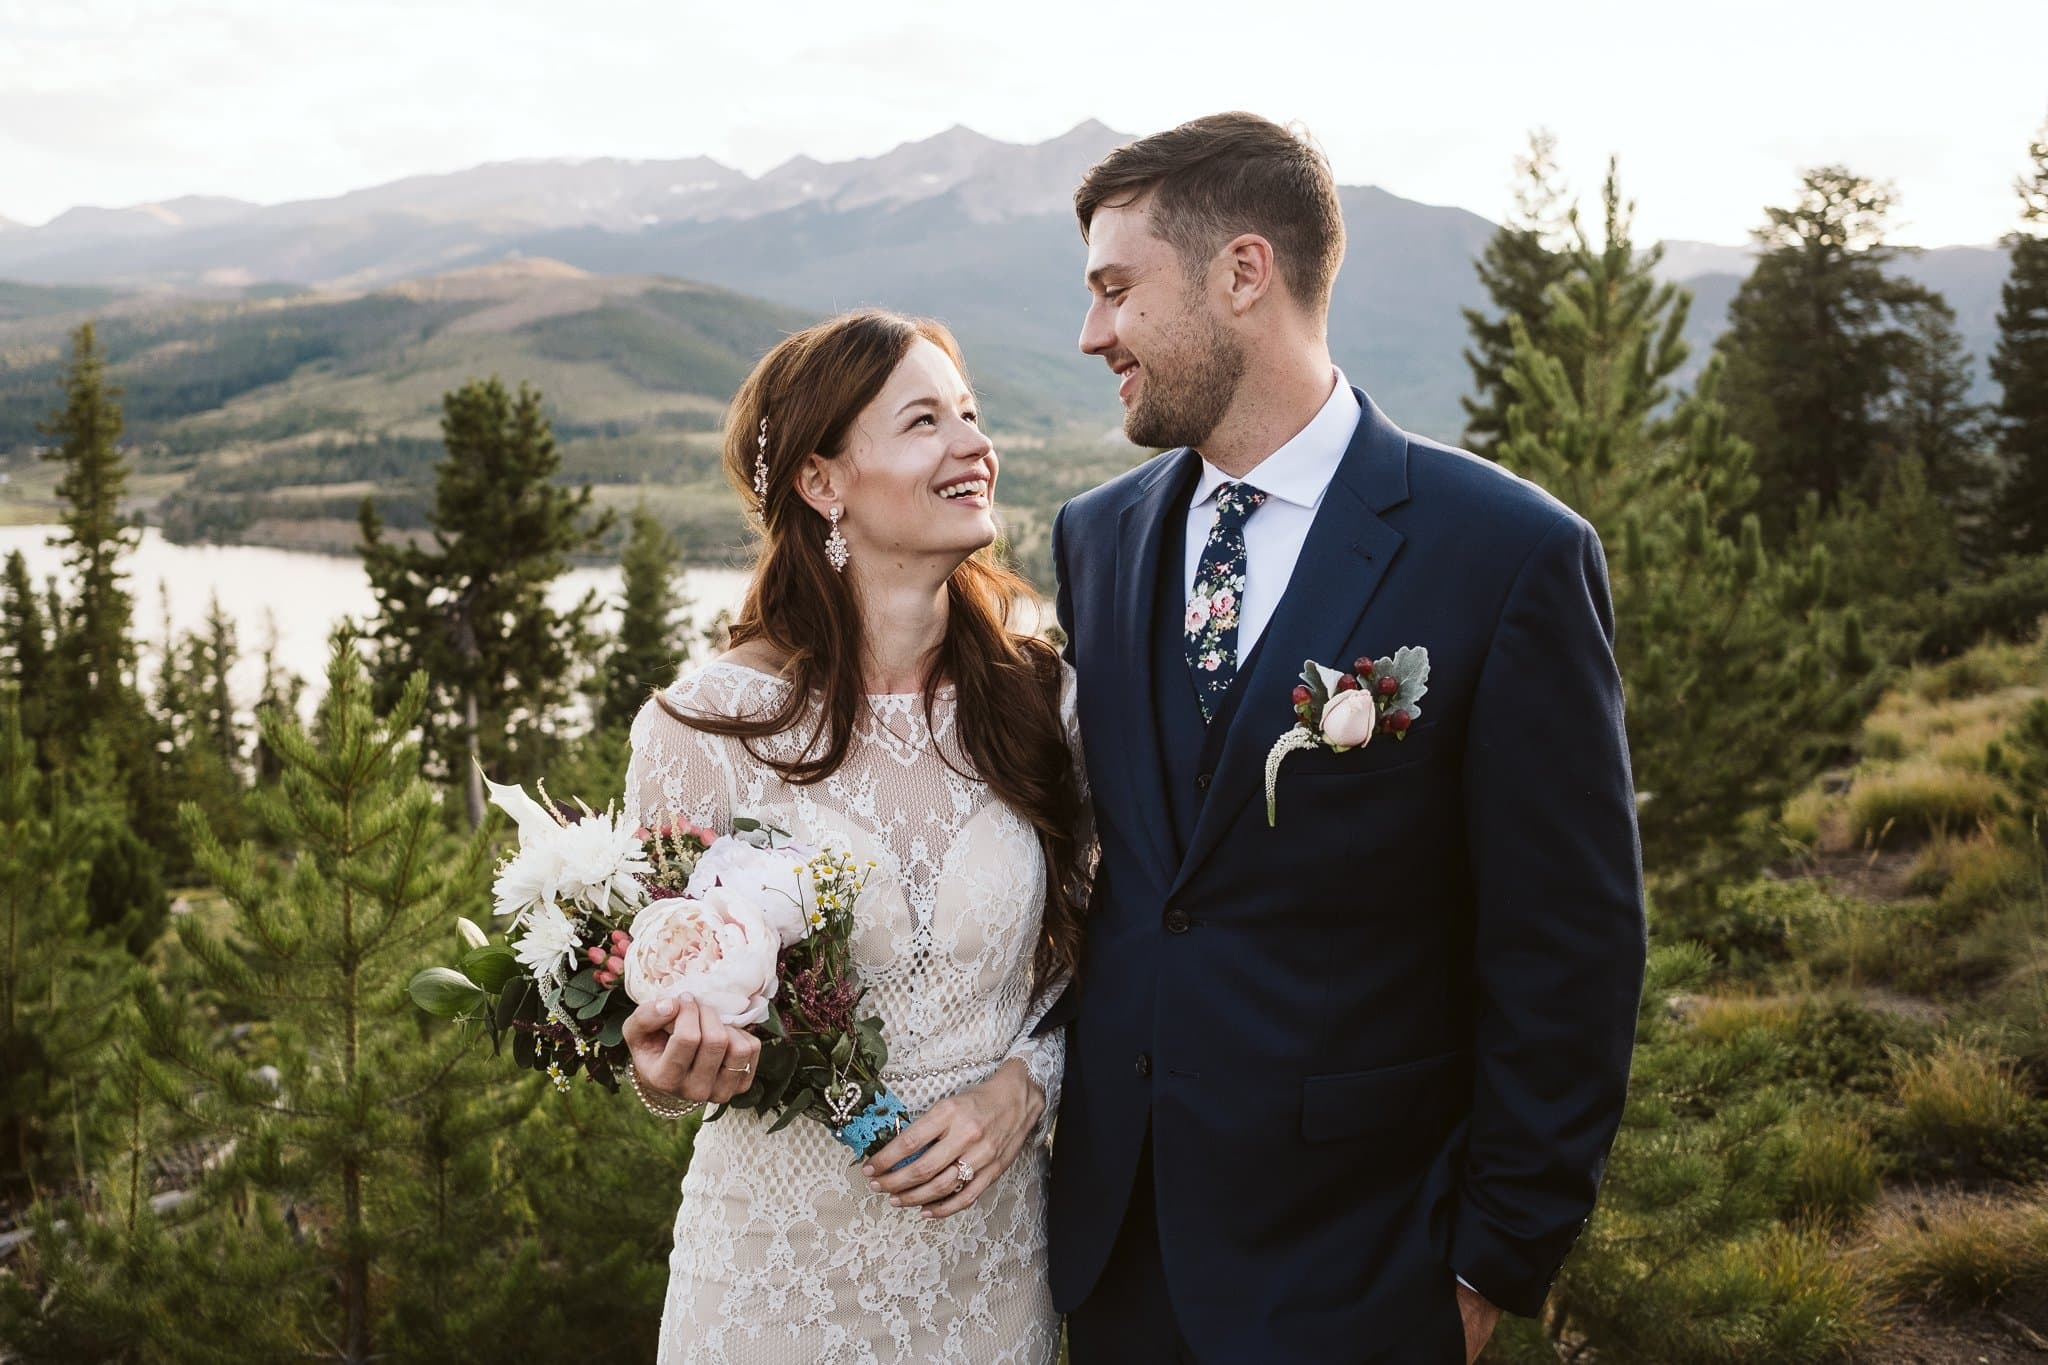 Bride and groom wedding portraits at Sapphire Point in Dillon, Colorado mountain wedding photos